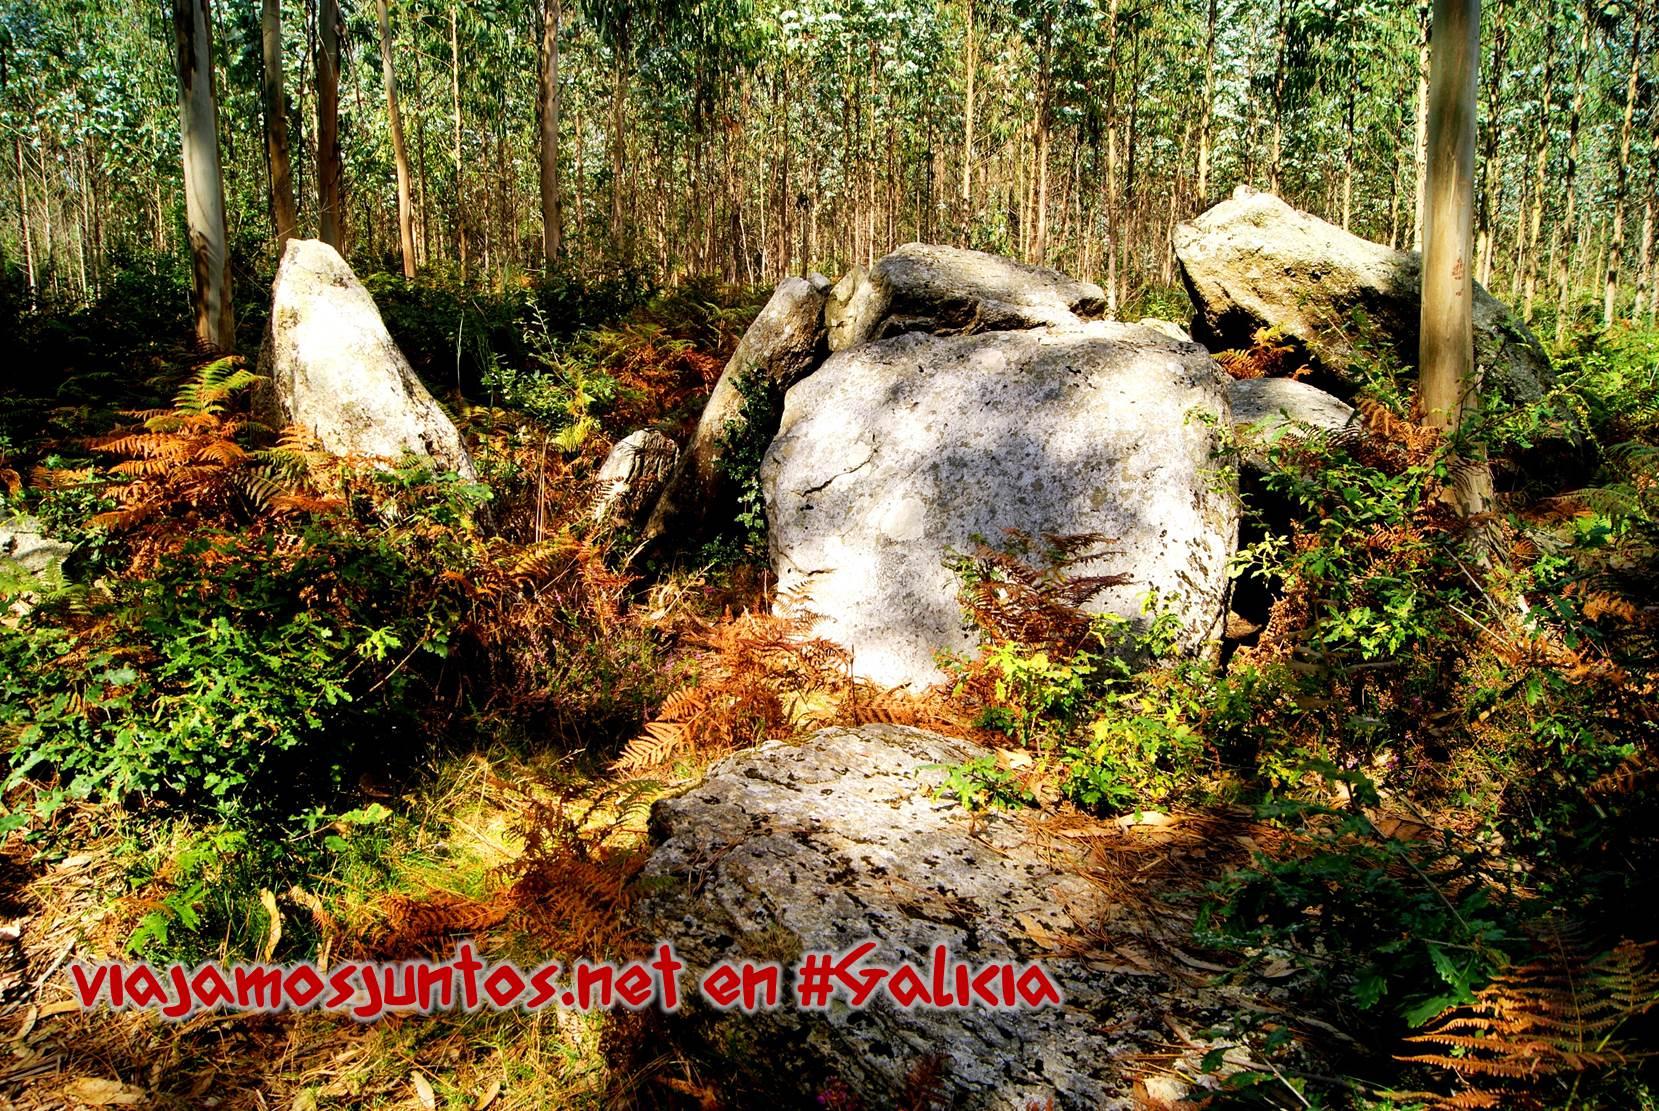 Dolmen Pedra da Lebre; Ruta de los dólmenes de Vimianzo; Dumbría, Costa da Morte, Galicia